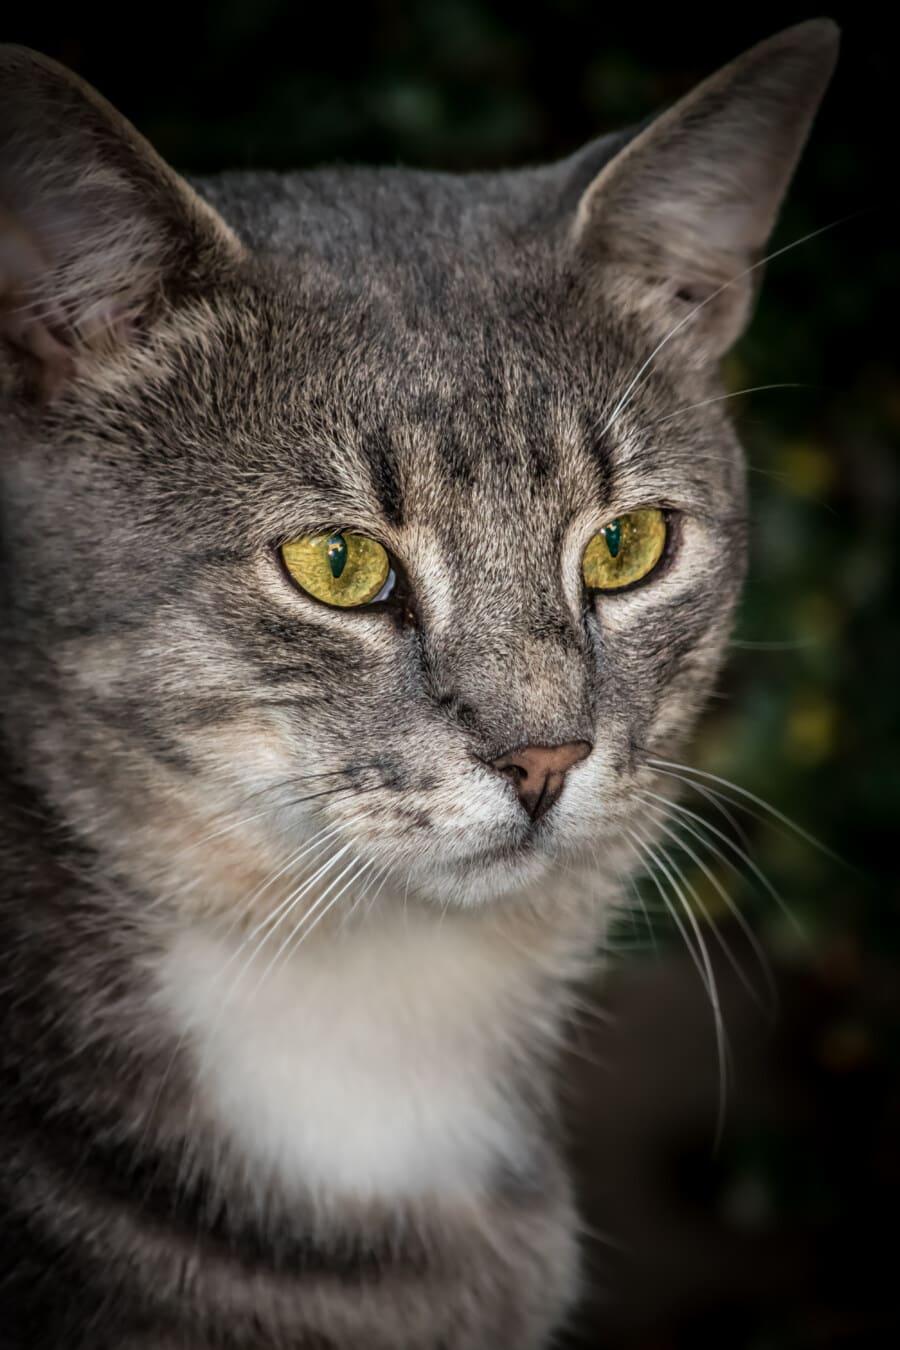 Reifen, gestreifte Katze, Augen, gelblich, Hauskatze, aus nächster Nähe, Haustier, Kopf, Pelz, Tier